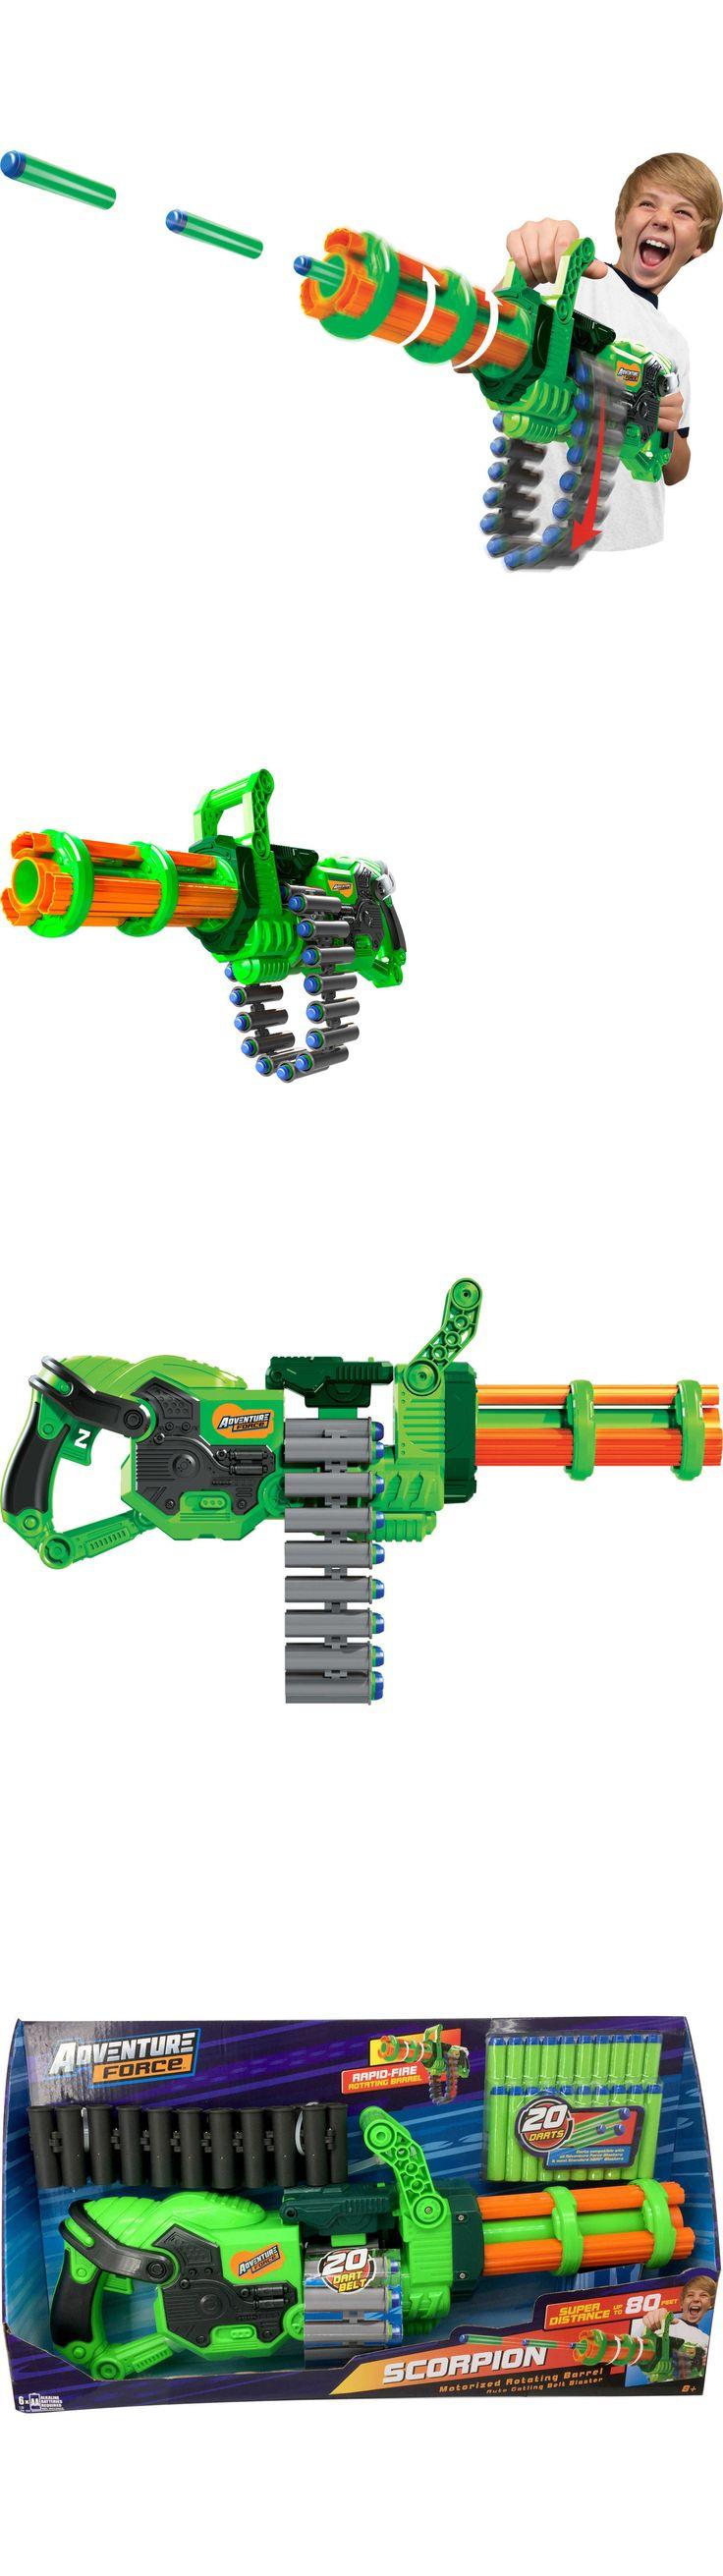 Dart Guns and Soft Darts 158749: Adventure Force Scorpion Motorized Gatling Blaster Automatic Gun Dart Toy New -> BUY IT NOW ONLY: $30.09 on eBay!